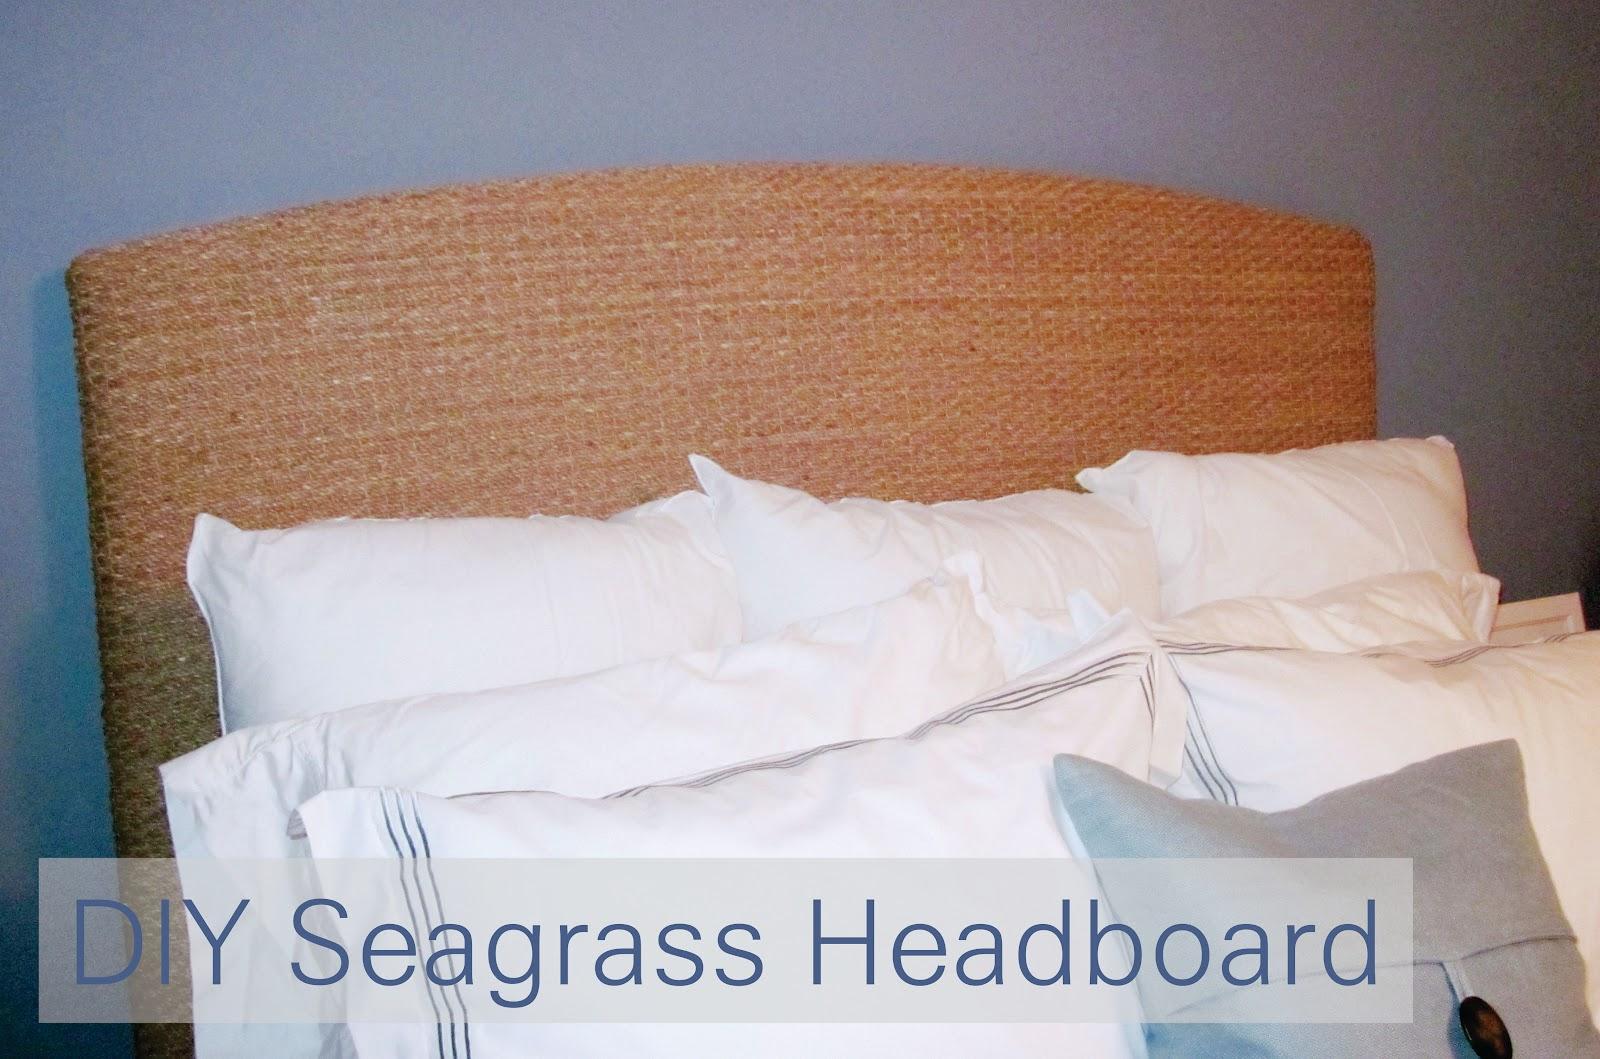 The Murphy's: DIY Seagrass Headboard